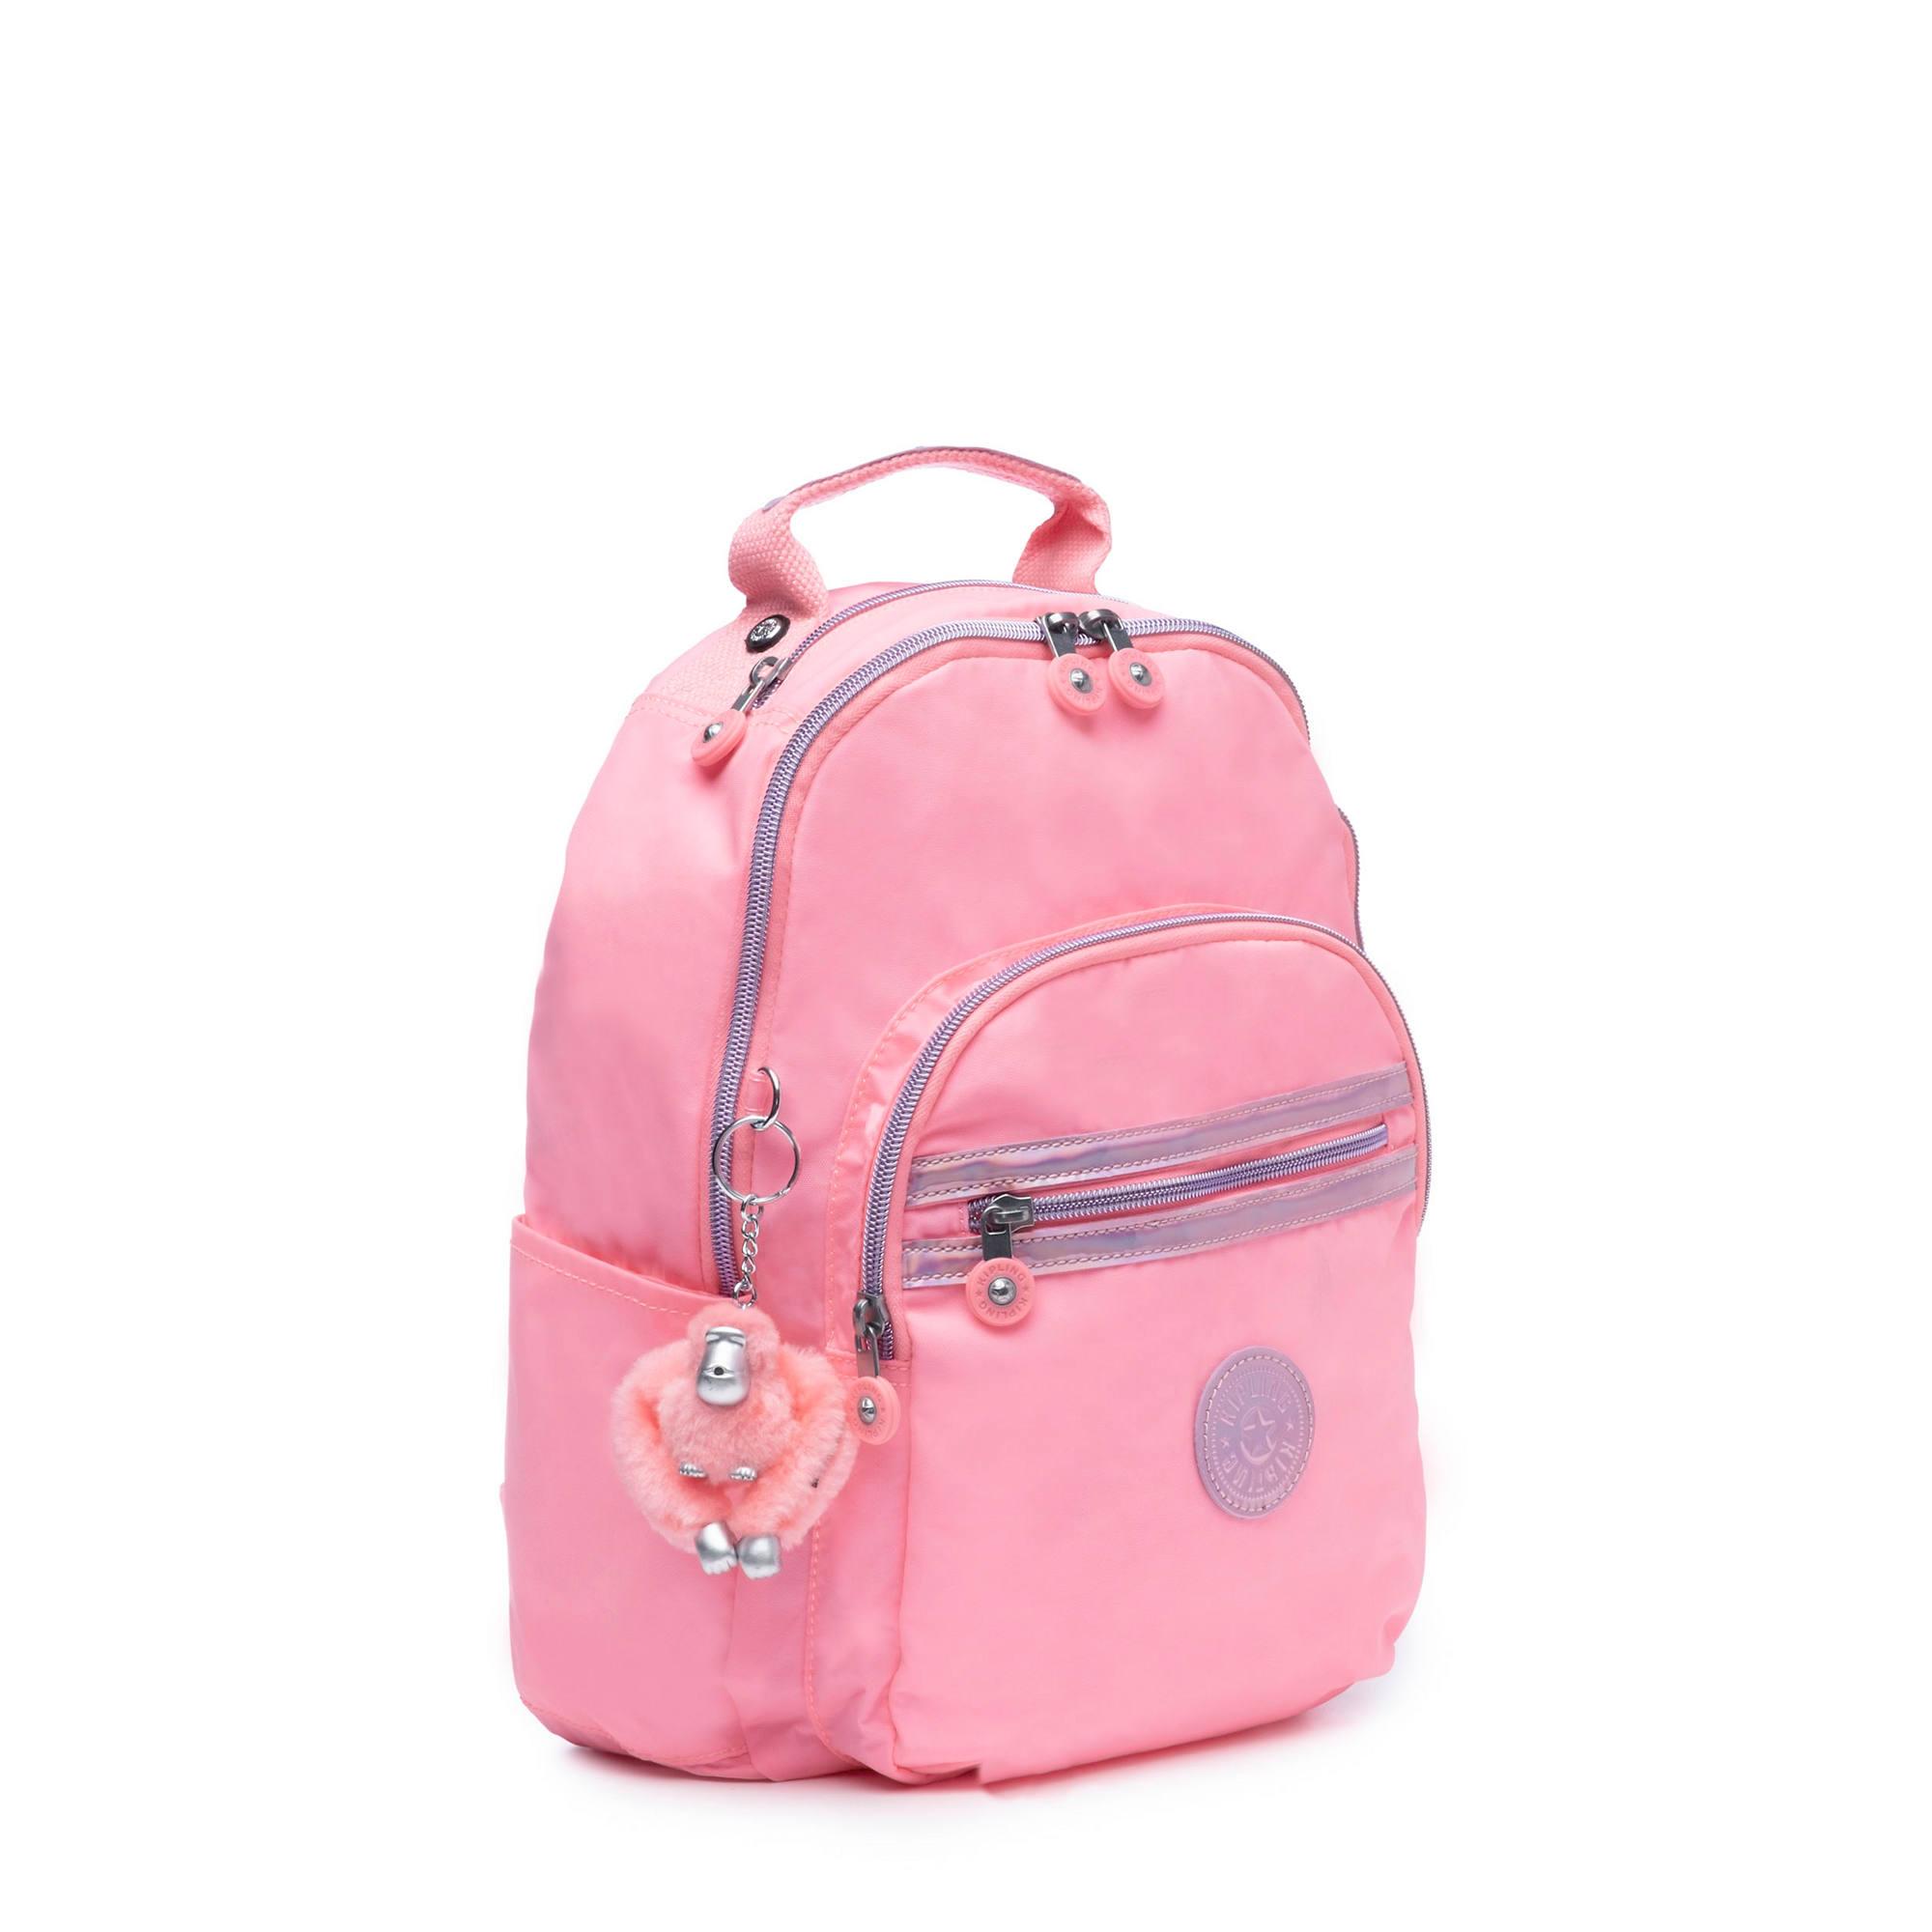 Kipling-Seoul-Small-11-034-Laptop-Backpack thumbnail 23